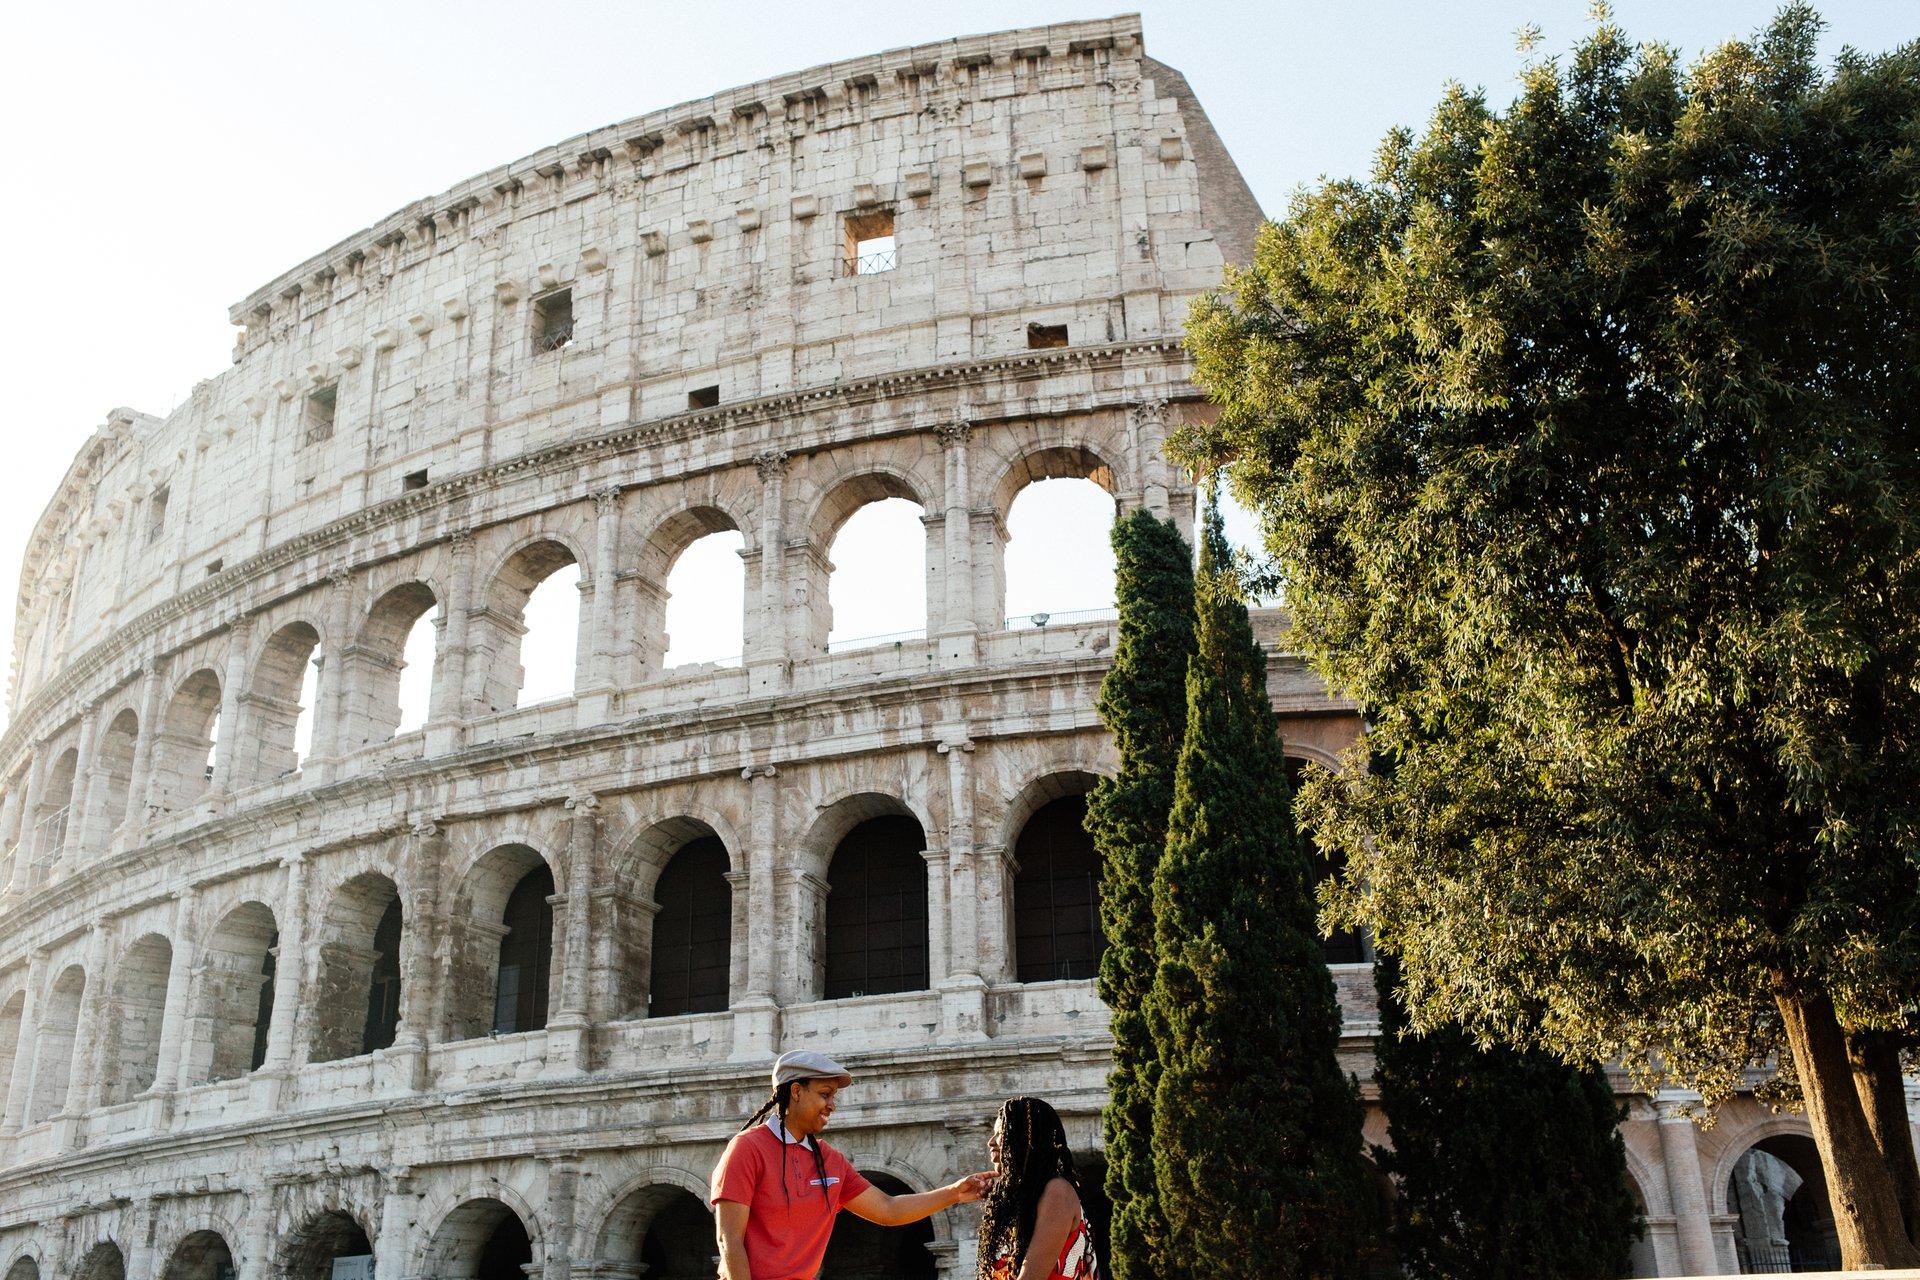 Rome-Italy-travel-story-Flytographer-37